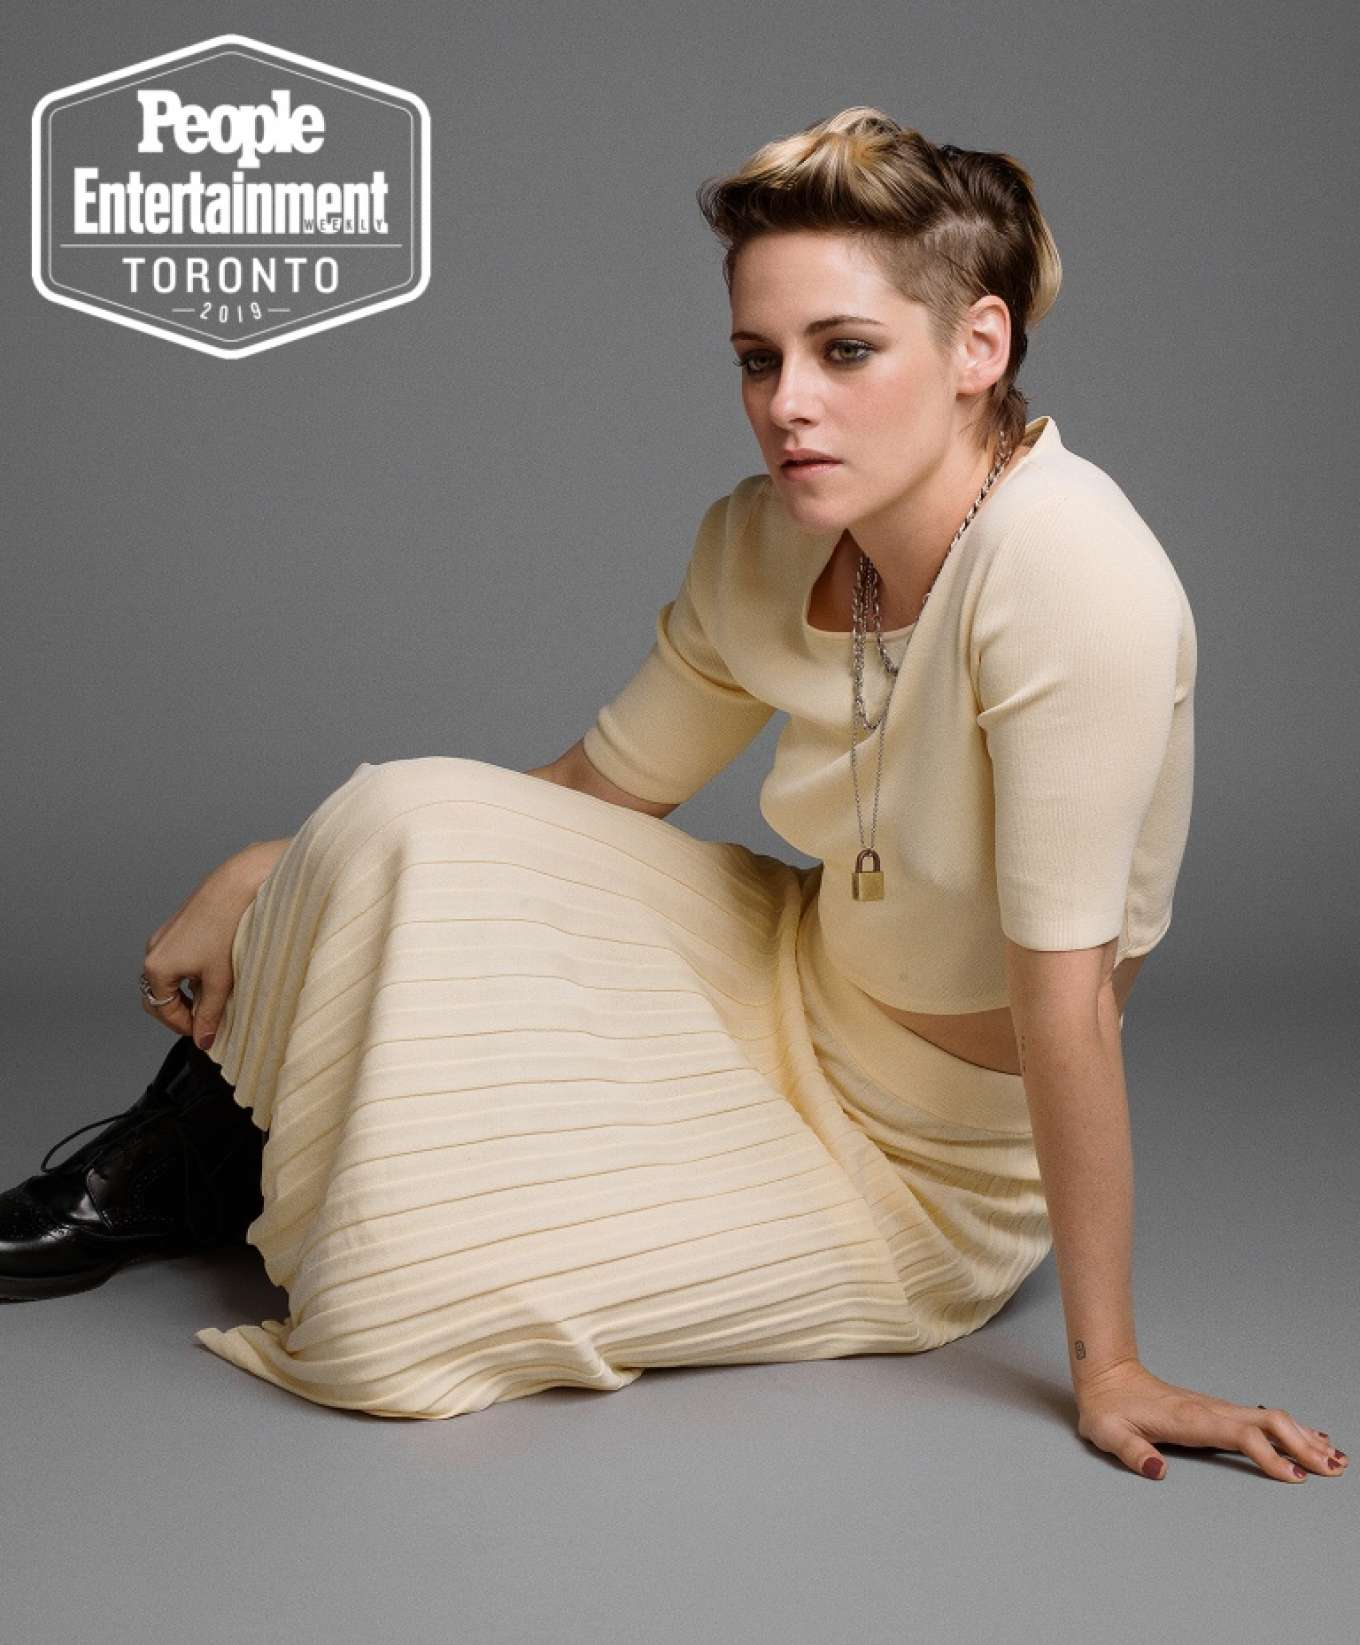 Kristen Stewart - PEOPLE Entertainment Weekly Portraits 2019 TIFF (September 2019)